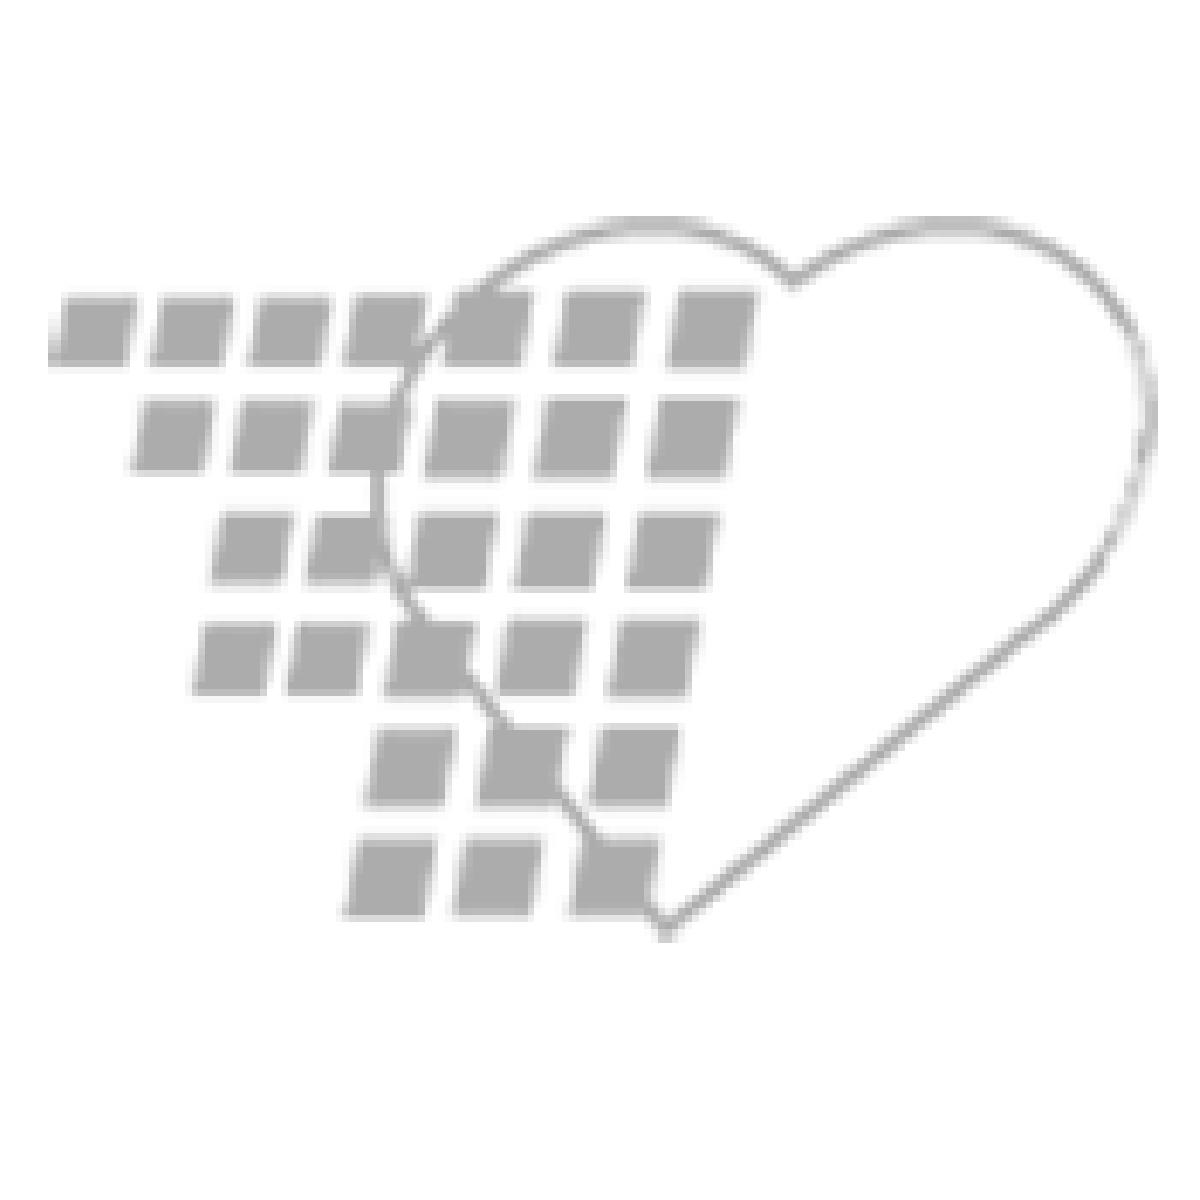 06-93-0731 Demo Dose® Clopidogrl (Plavx) 75mg